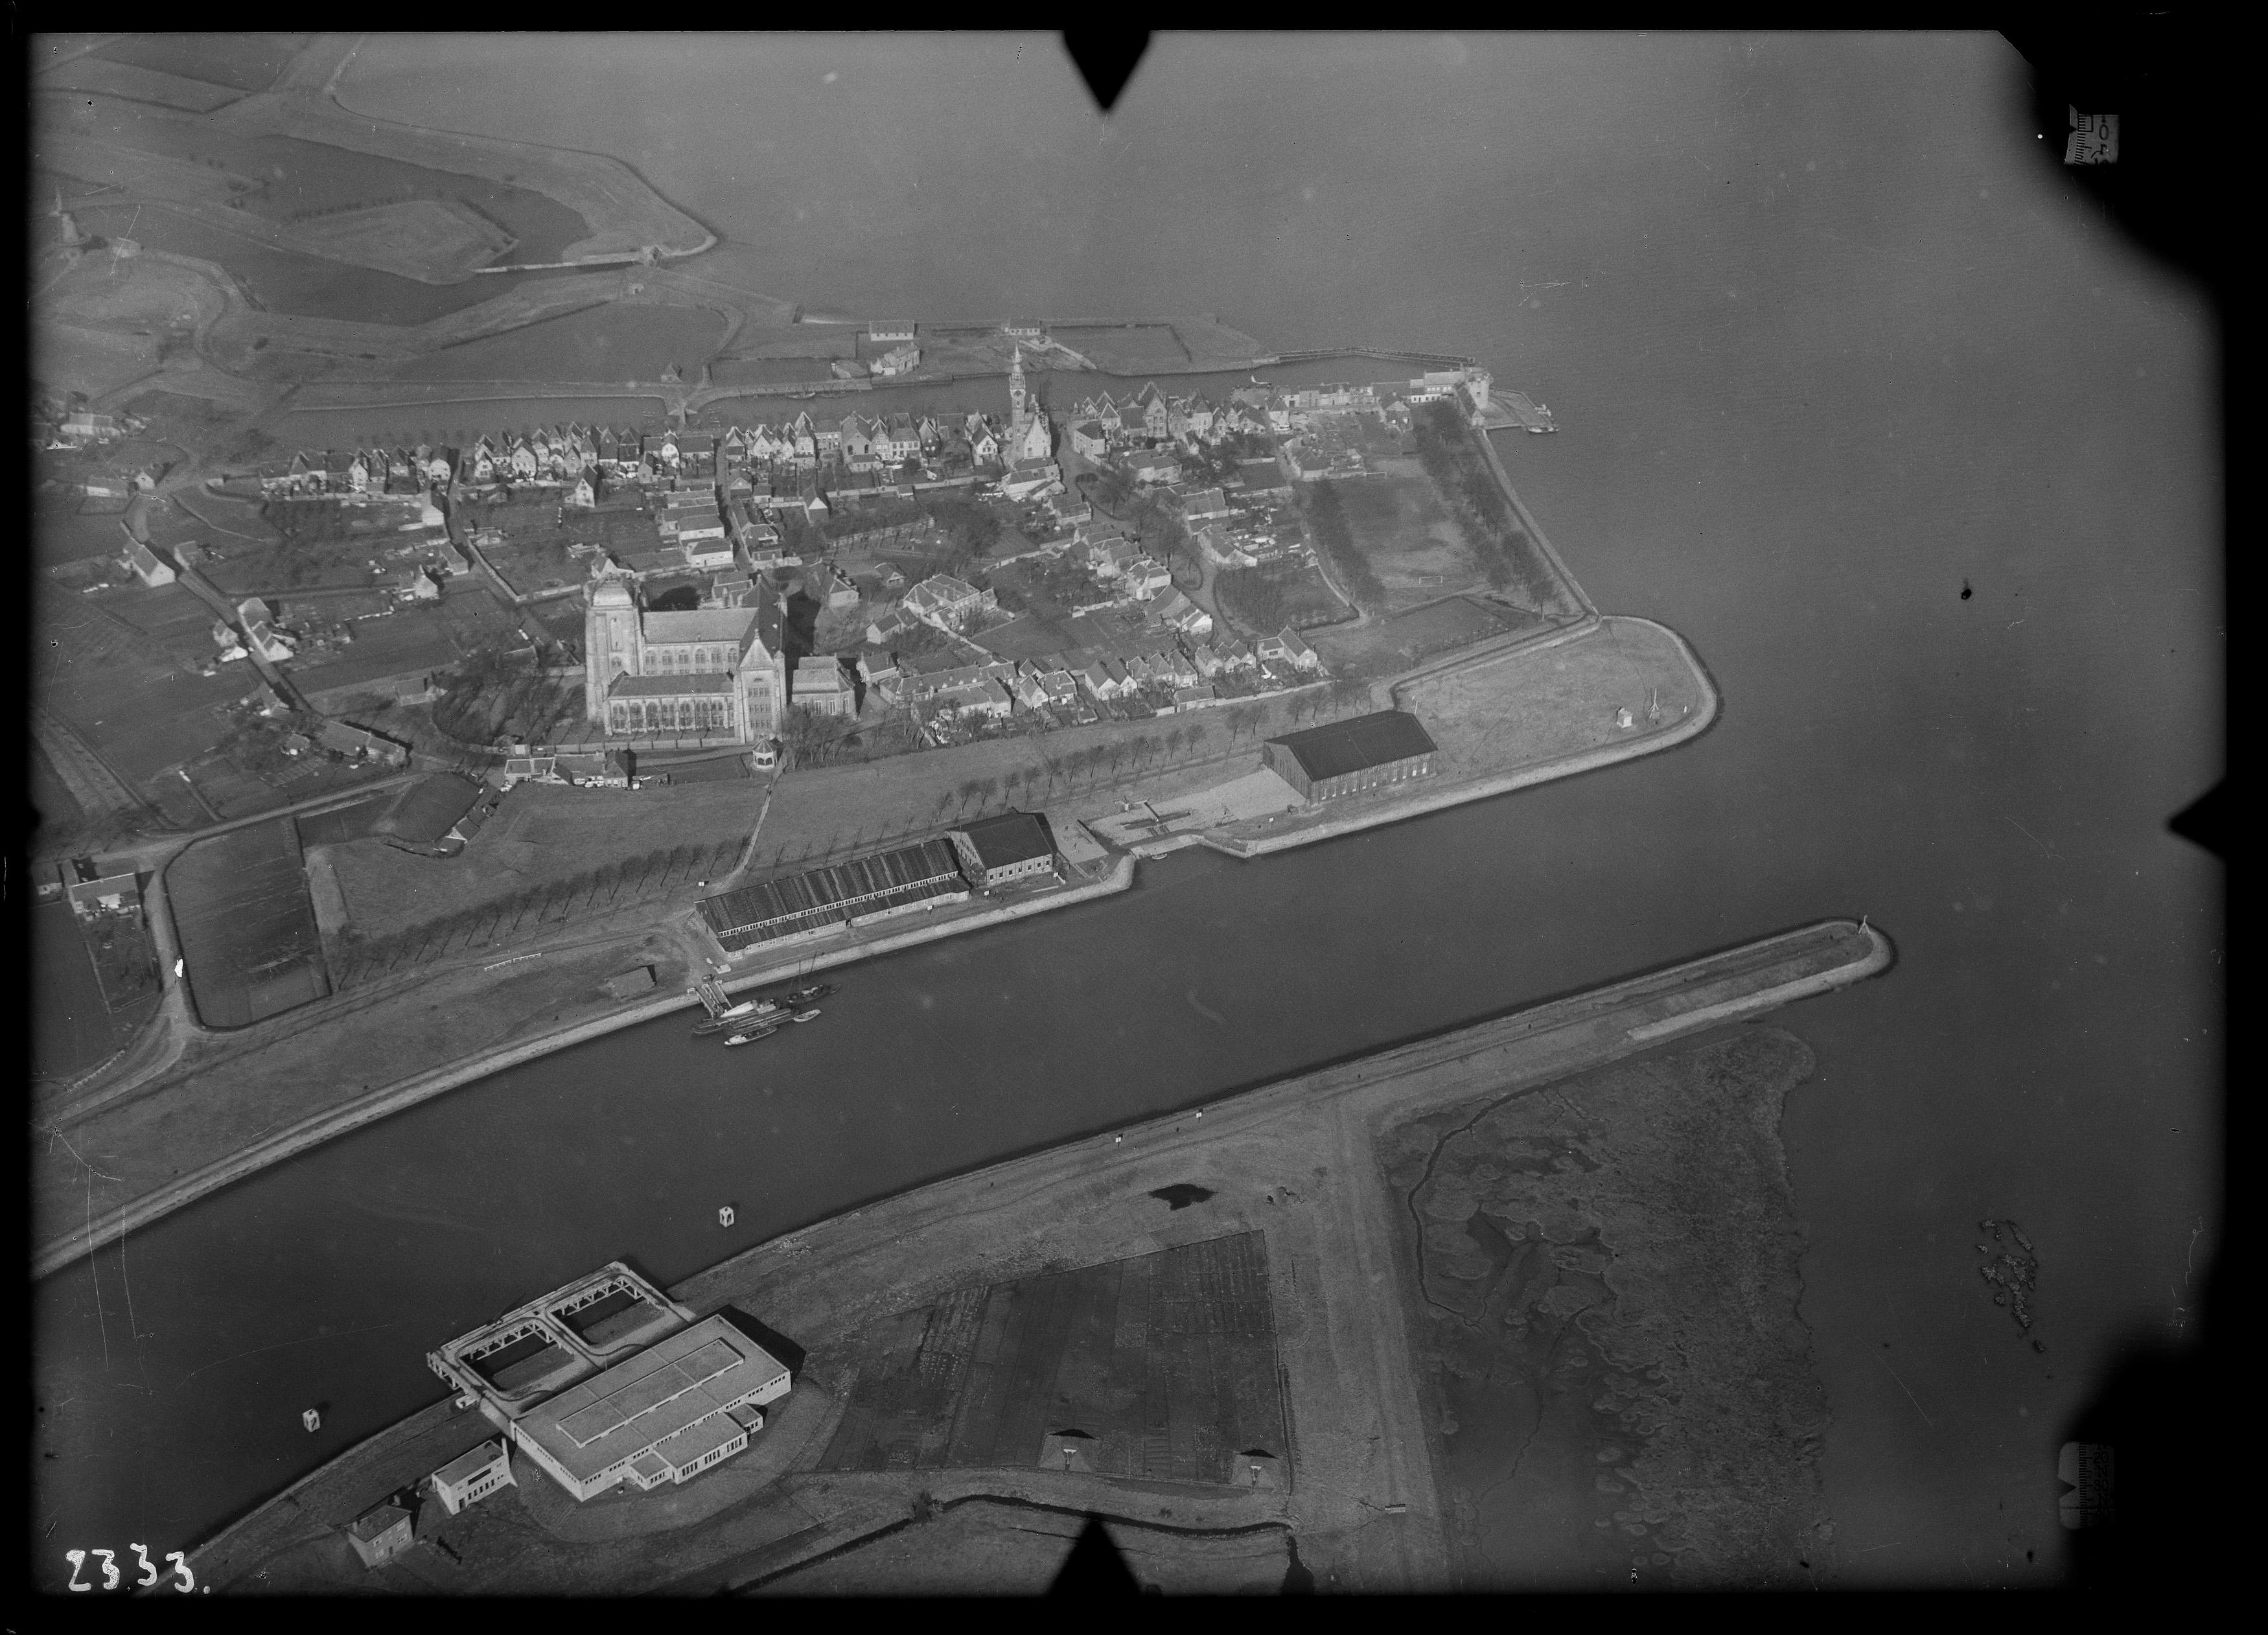 NIMH_-_2011_-_0541_-_Aerial_photograph_o